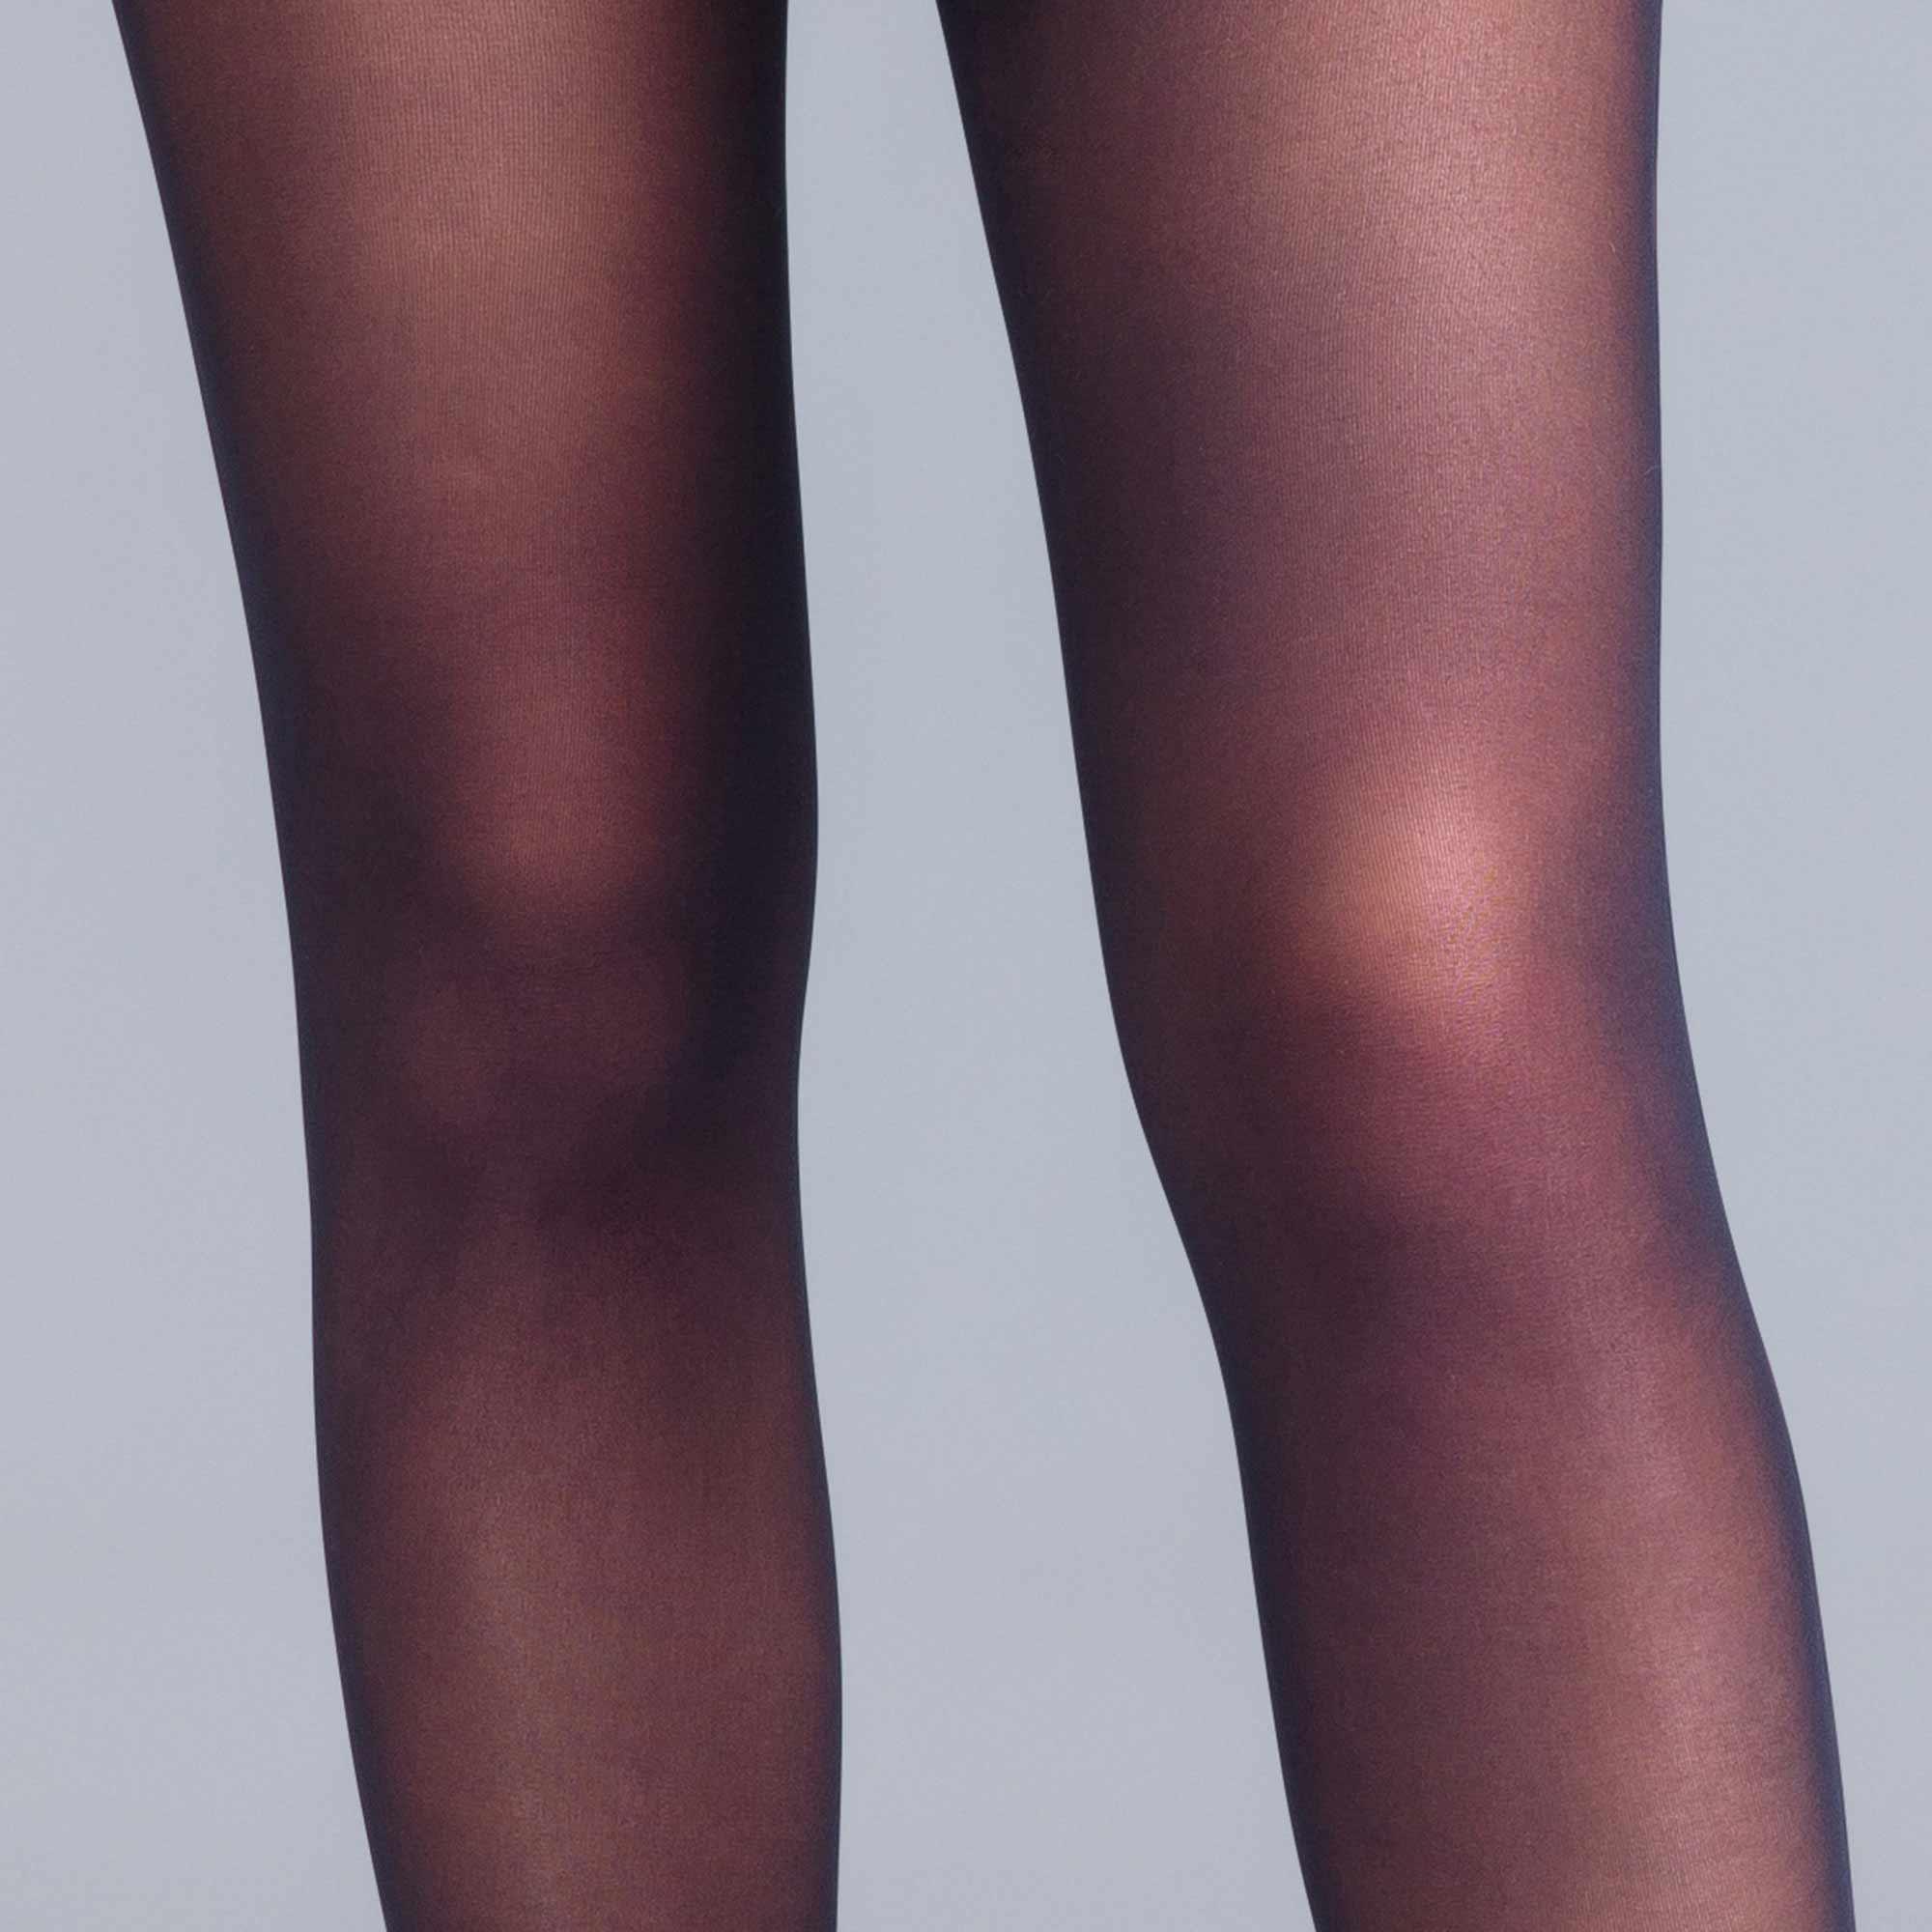 Body Touch 30D semi-opaque nude sensation tights 8afcfaecb3a